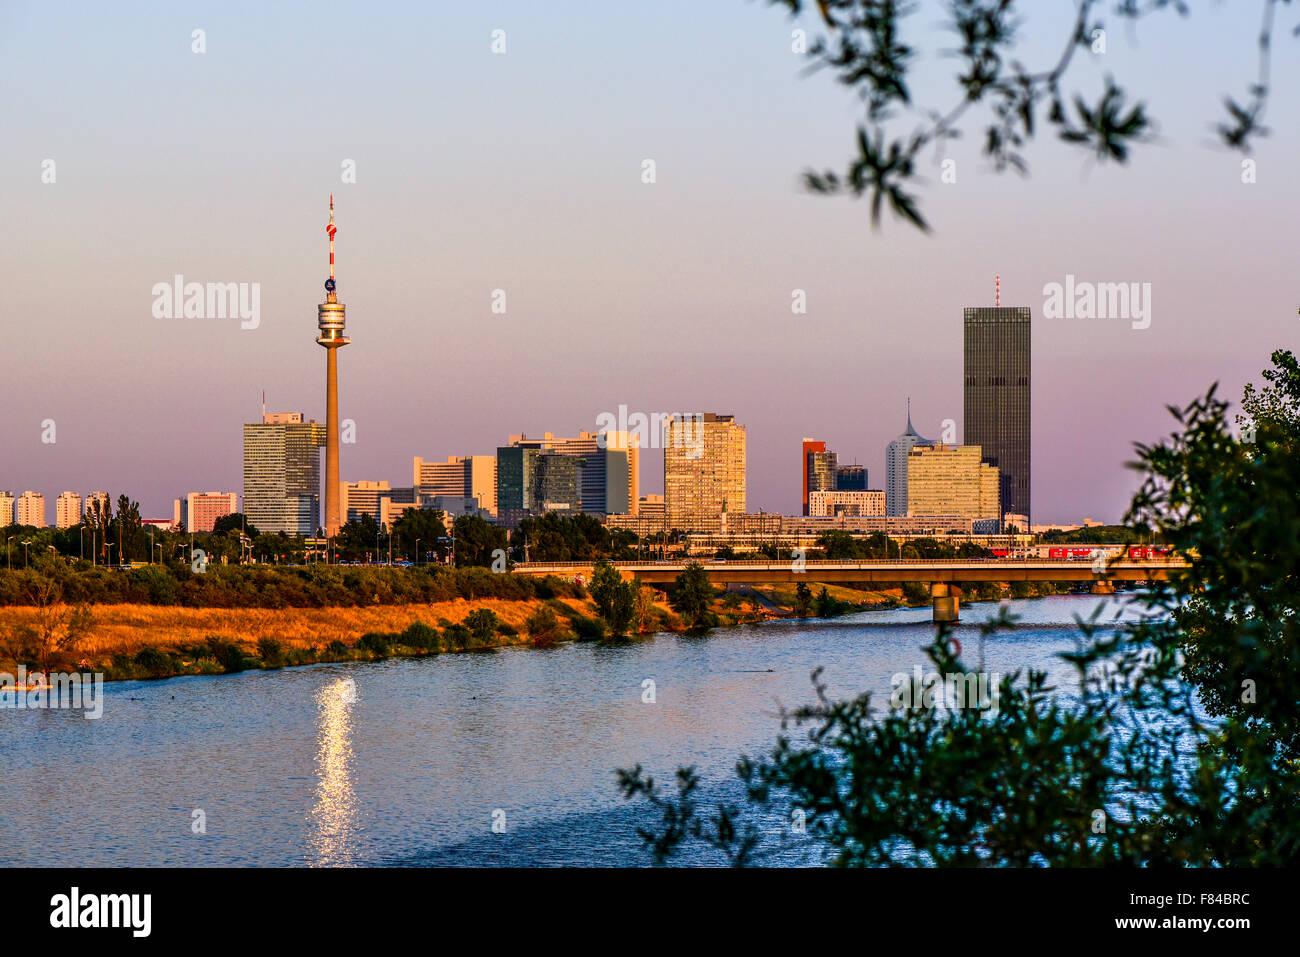 Danube city, river Danube, Vienna, Austria - Stock Image